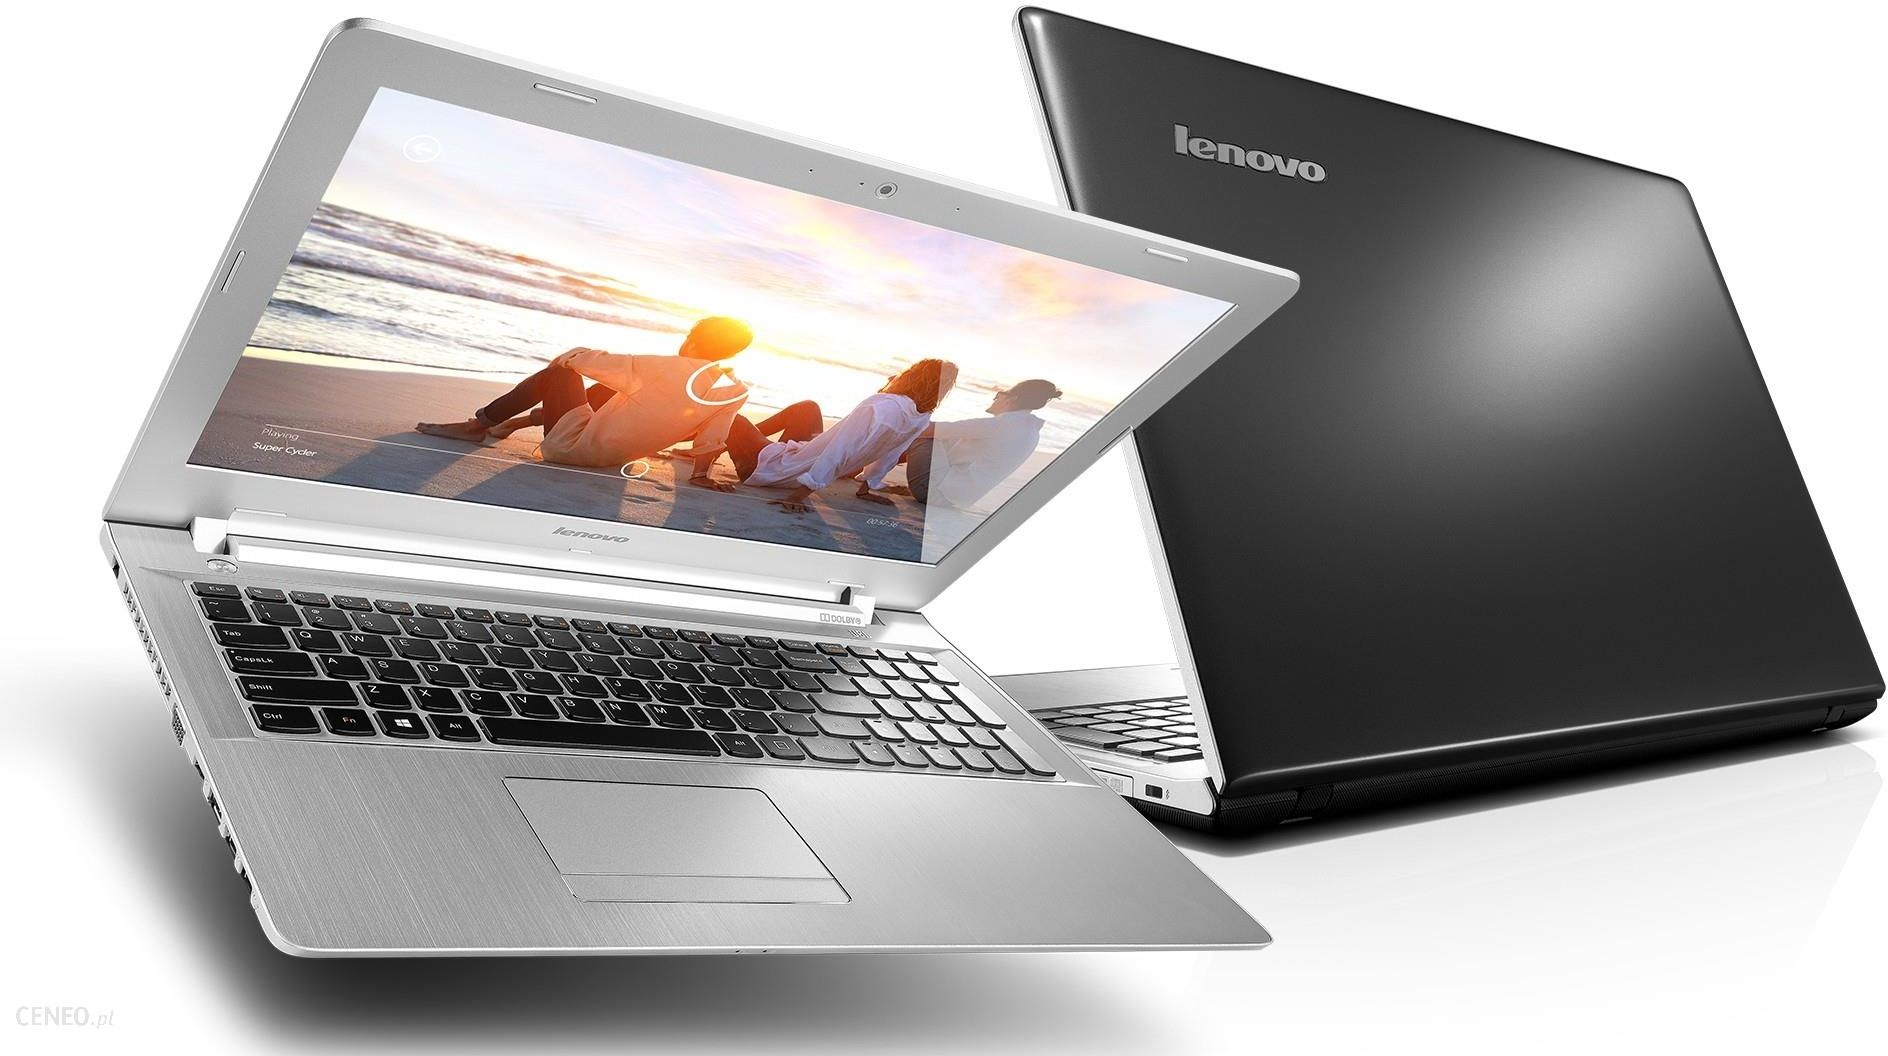 Laptop Lenovo IdeaPad Z51 70 80K601DRPB zdjęcie 1